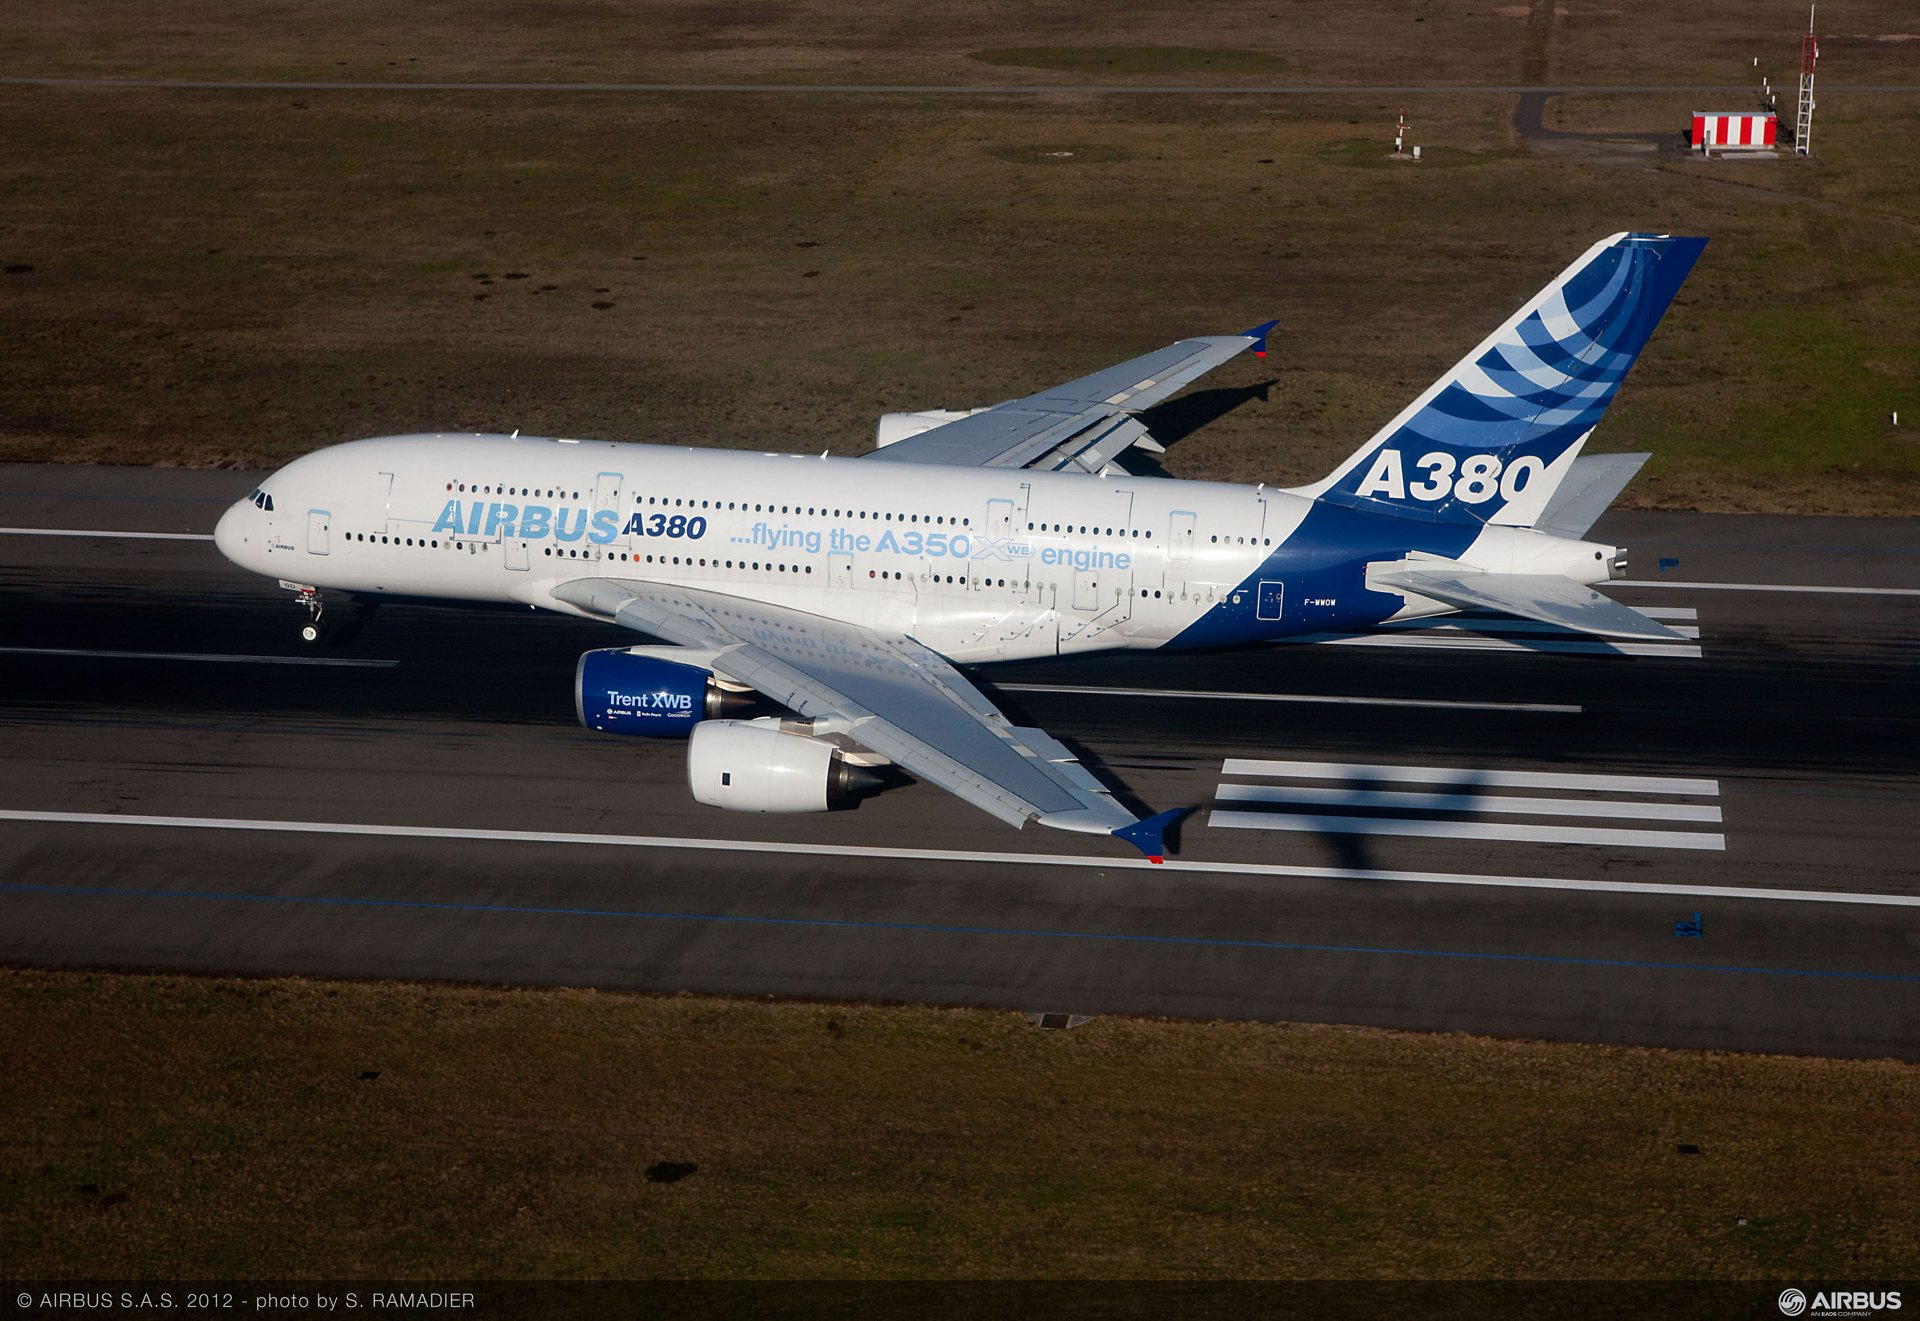 A350 Trent XWB engine first flight on A380 landing